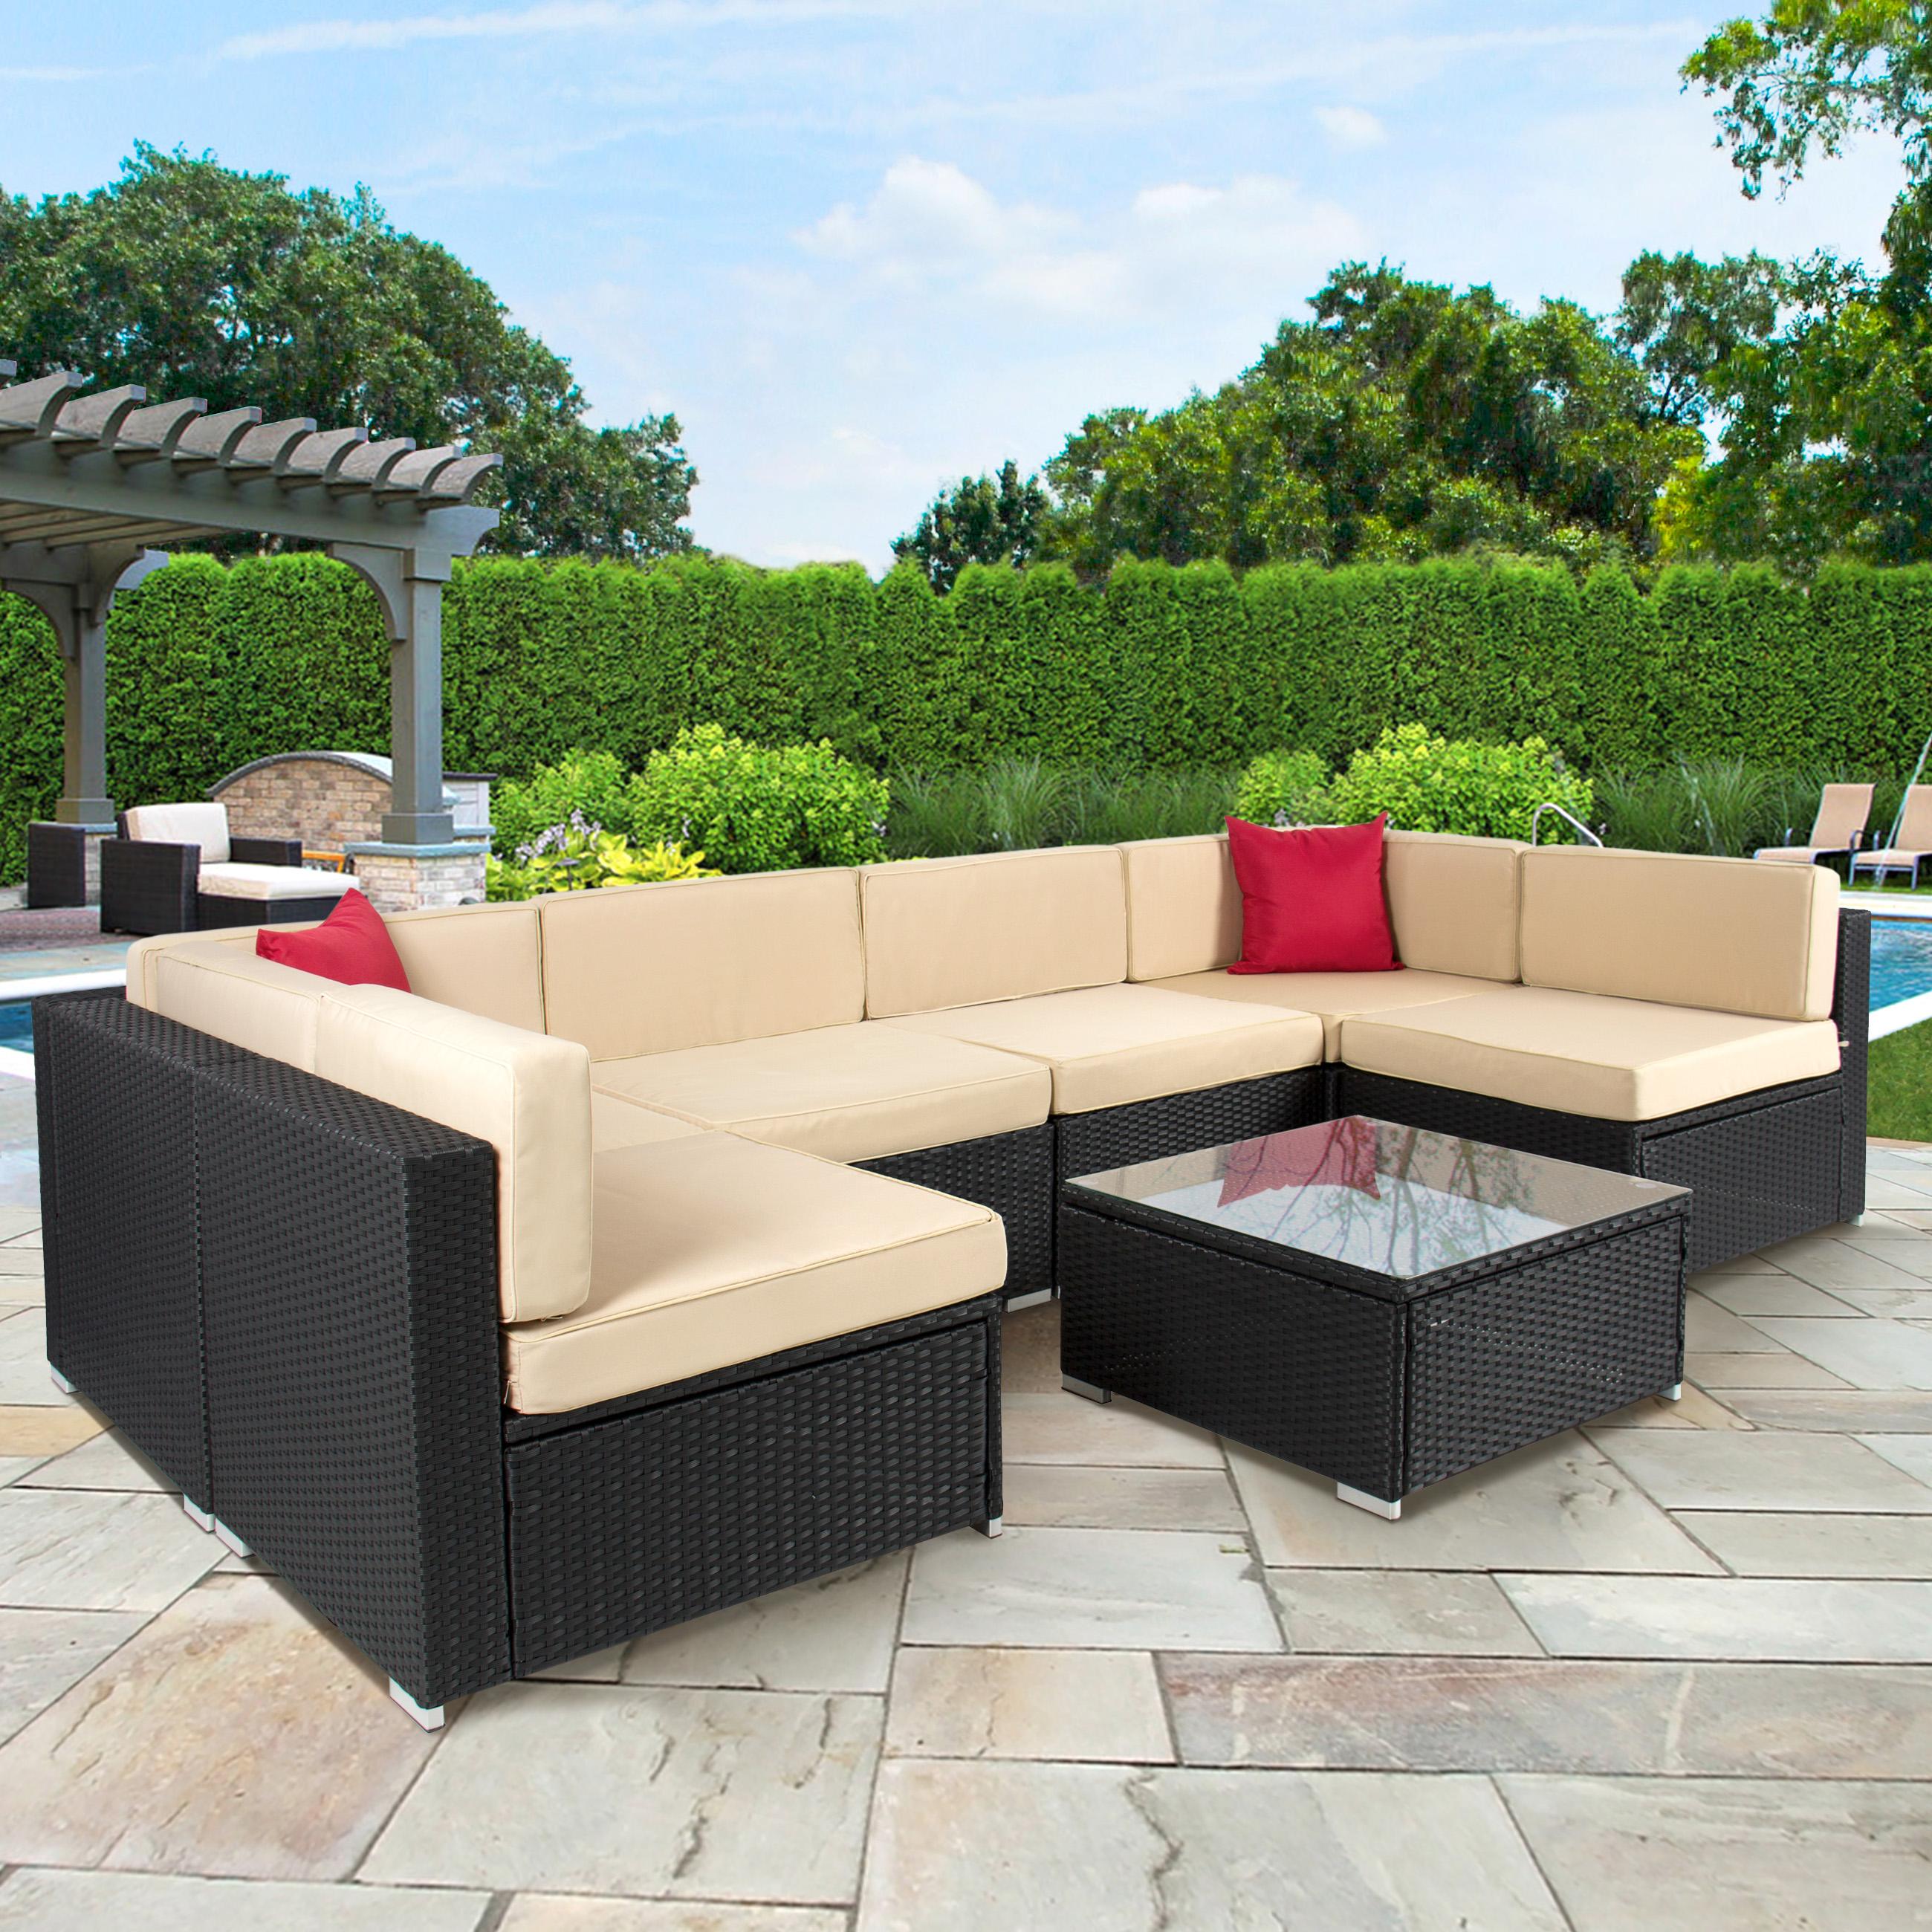 Rattan Outdoor Furniture 4pc Patio Garden Wicker Sofa Set Black